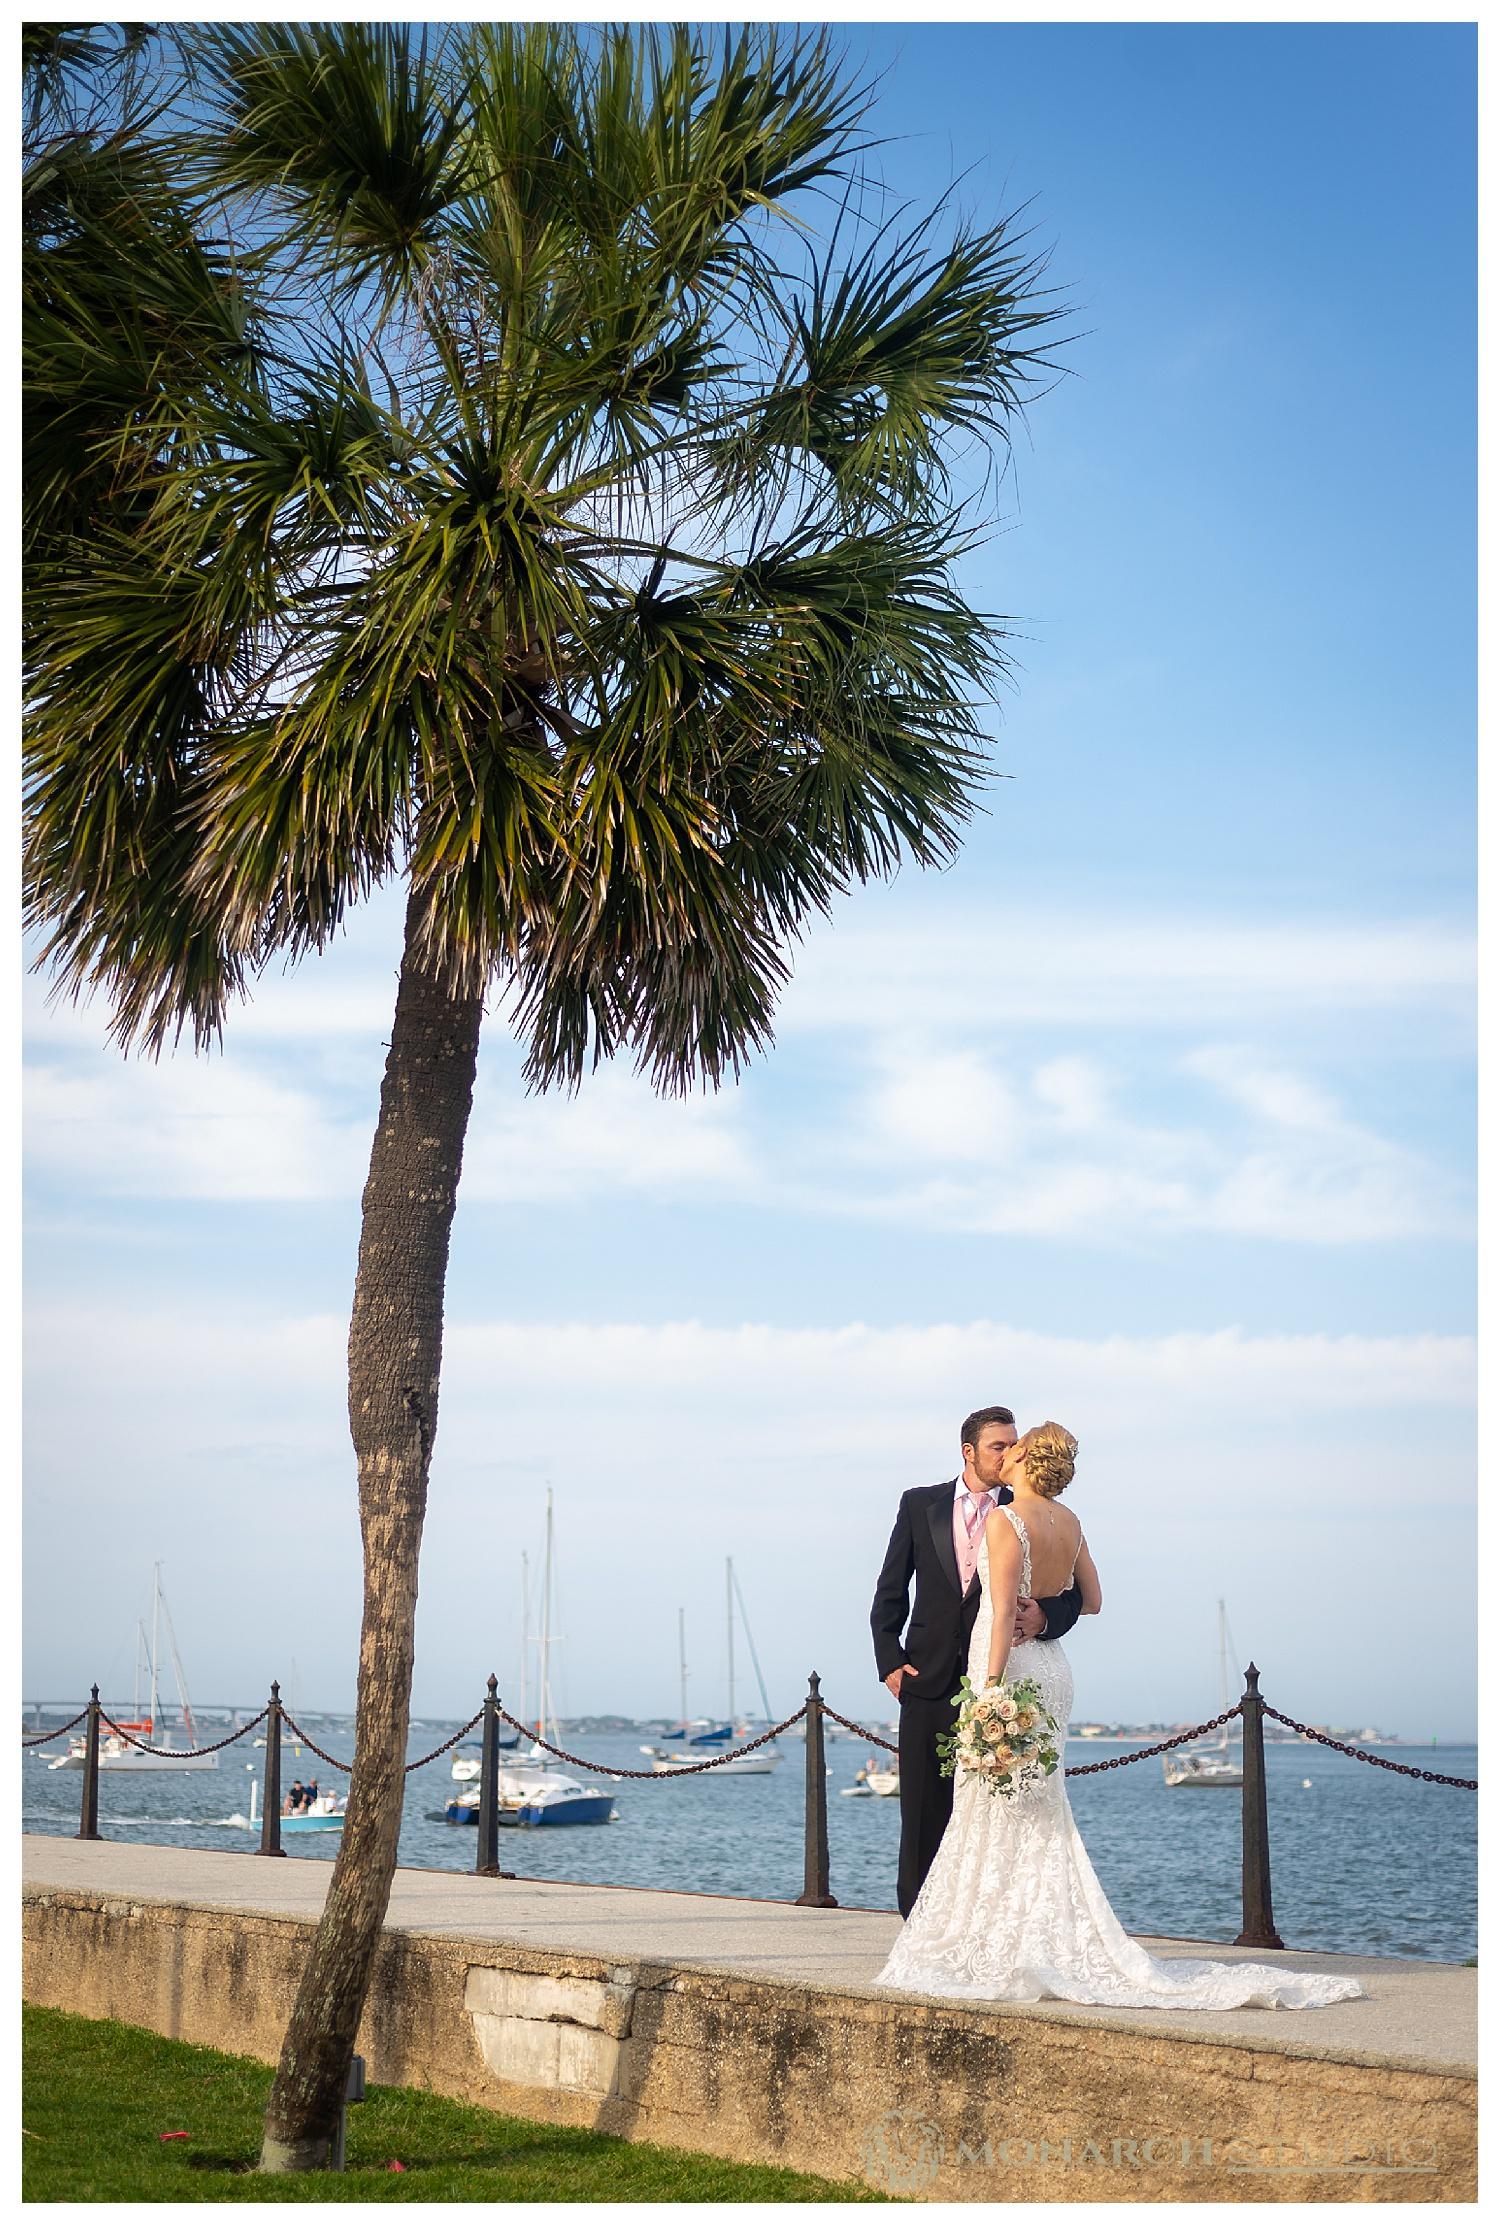 St. Augustine Wedding - Amore Wedding Chapel - 051.JPG